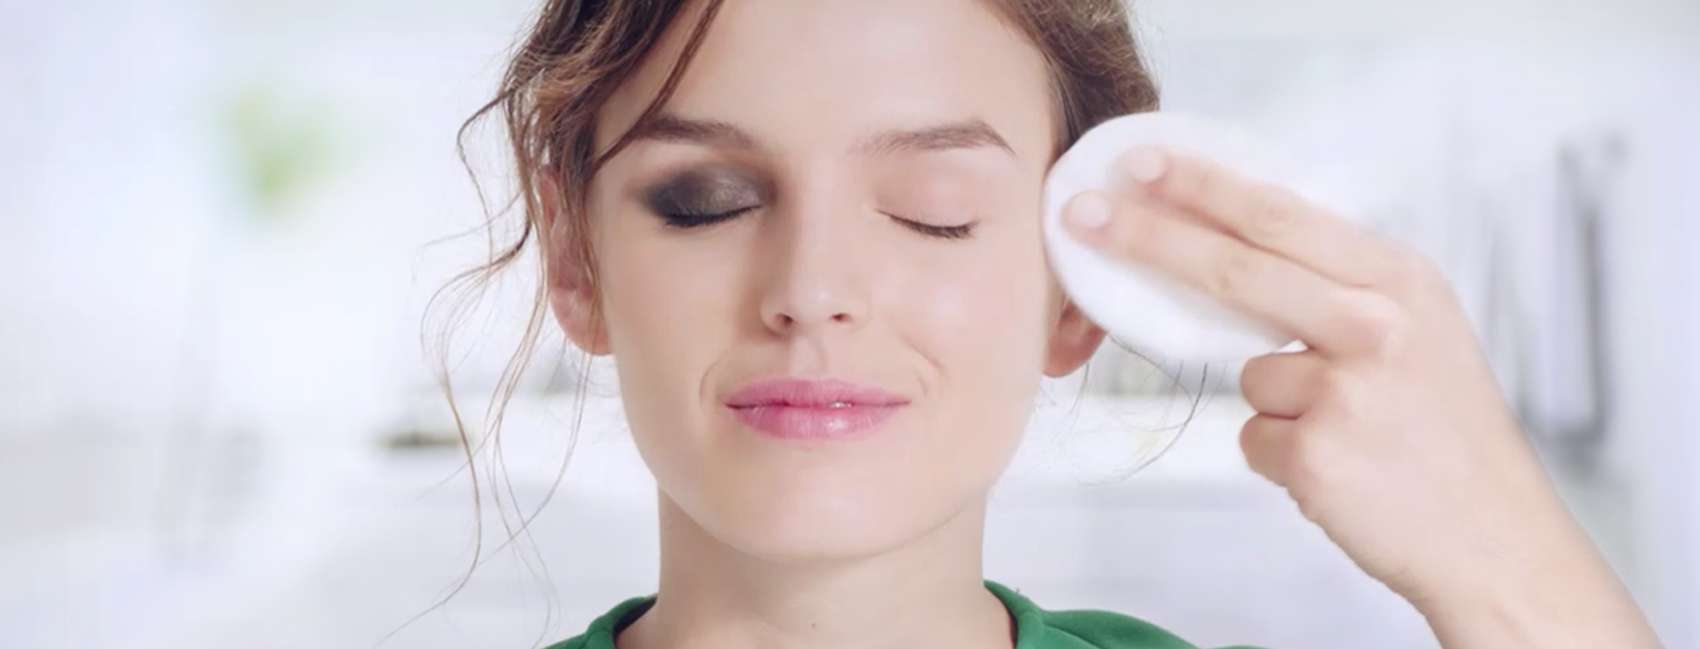 چگونه چشم هایی زیبا و جذاب داشته باشیم؟ چگونه چشم هایی زیبا و جذاب داشته باشیم؟ چگونه چشم هایی زیبا و جذاب داشته باشیم؟ 1099042 simple how to remove your party make up green top wiping